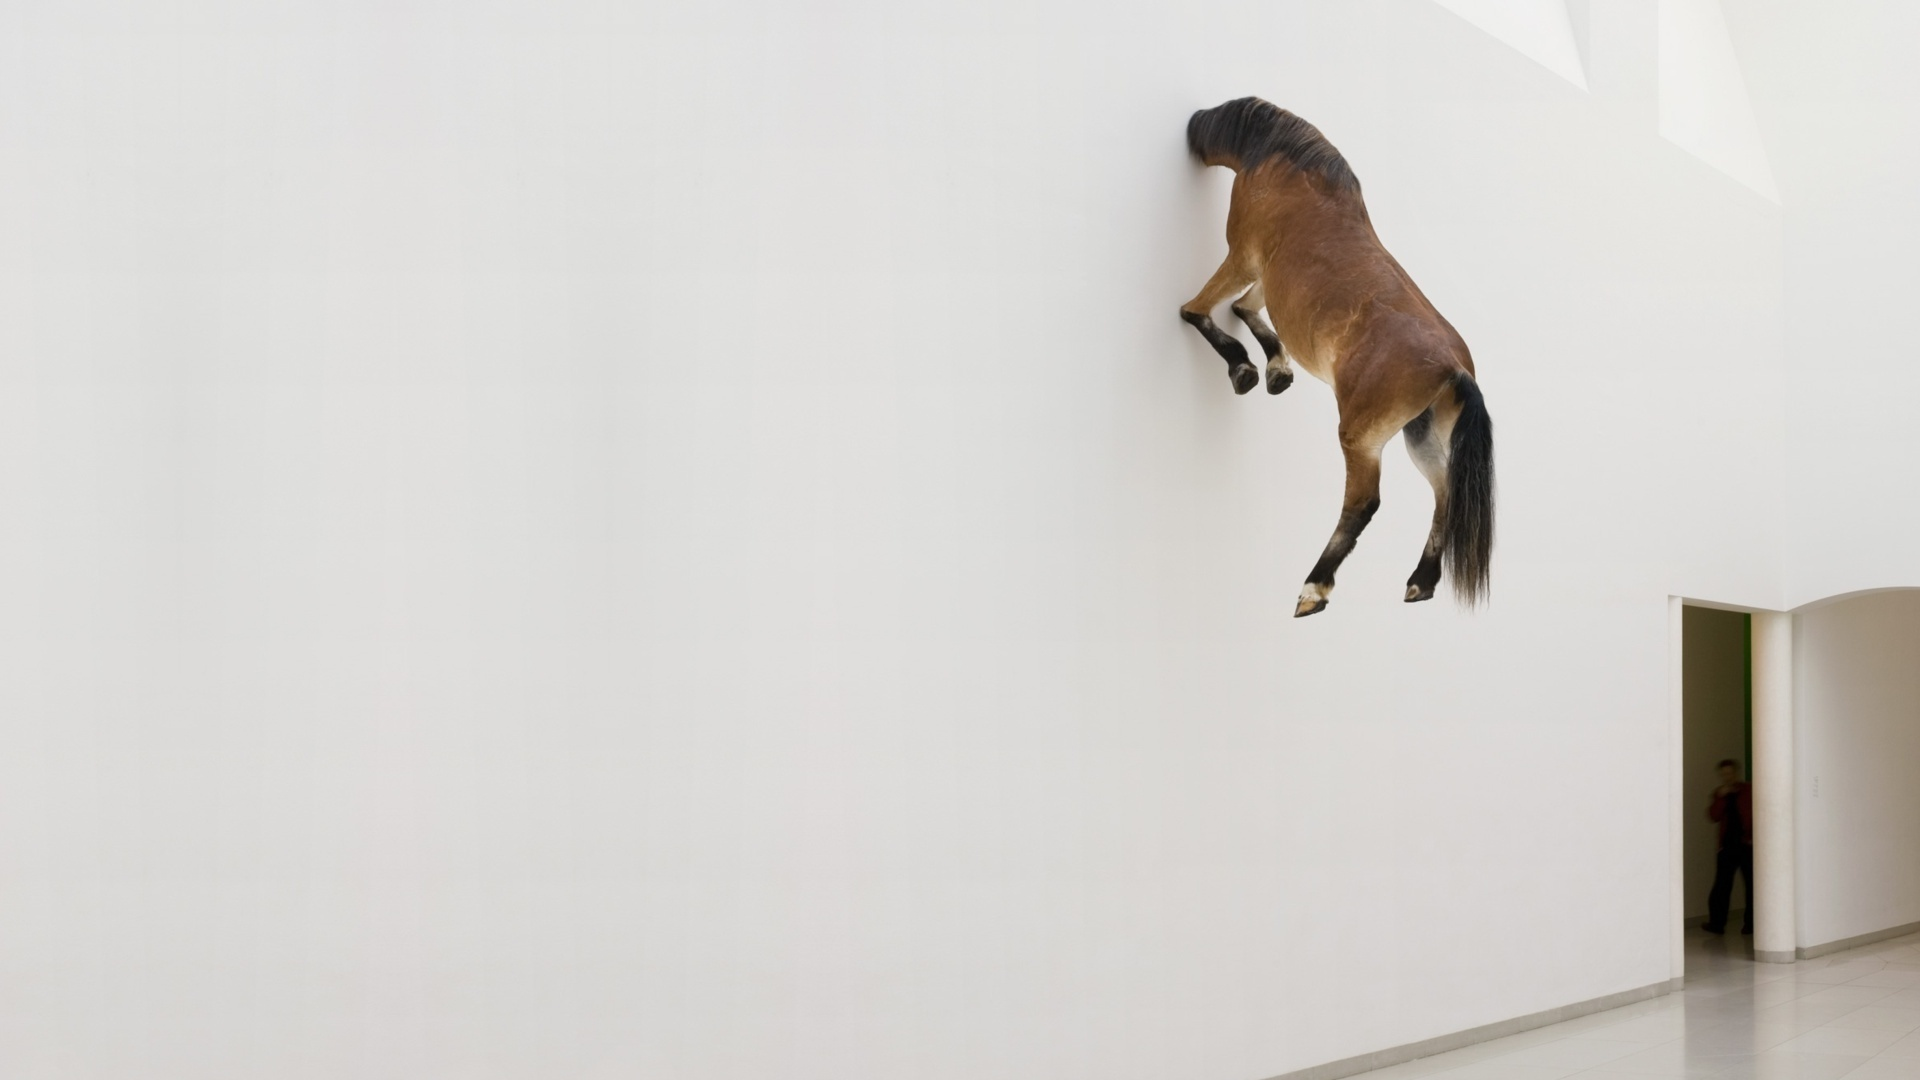 Japan Fall Colors Wallpaper Horse In Wall Wallpaper 1920x1080 25148